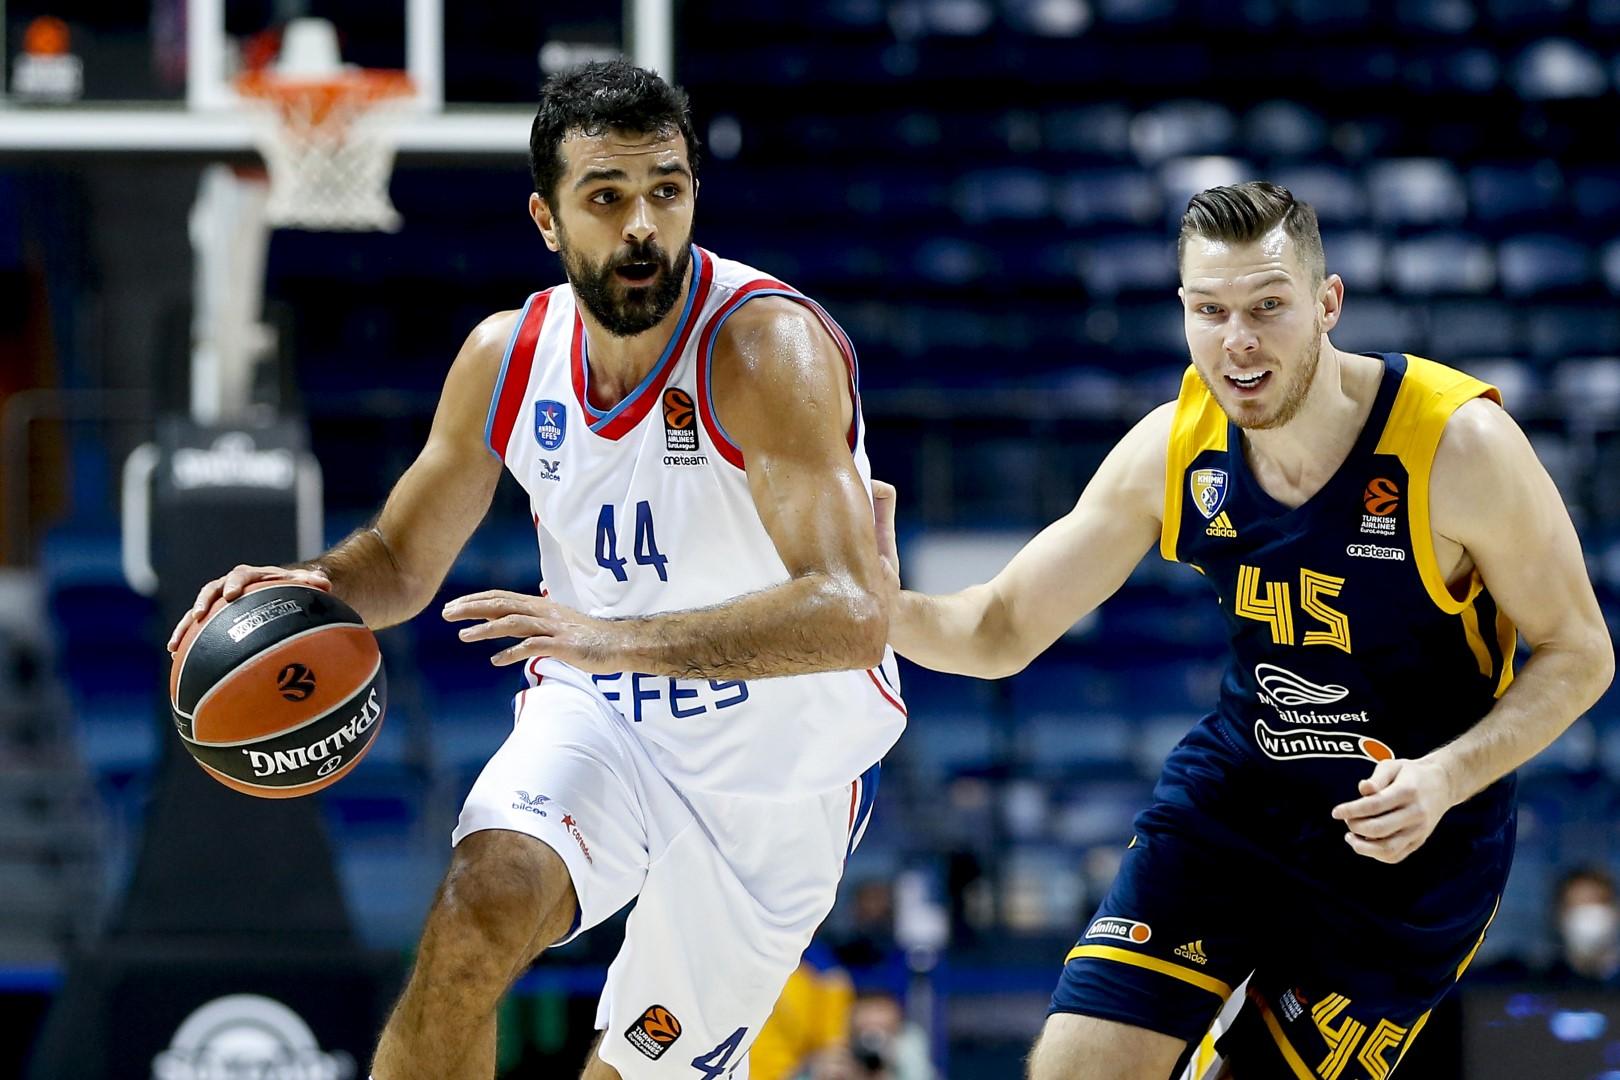 EuroLeague – Premiata ditta Simon & Larkin, l'Efes banchetta a Mosca contro il Khimki